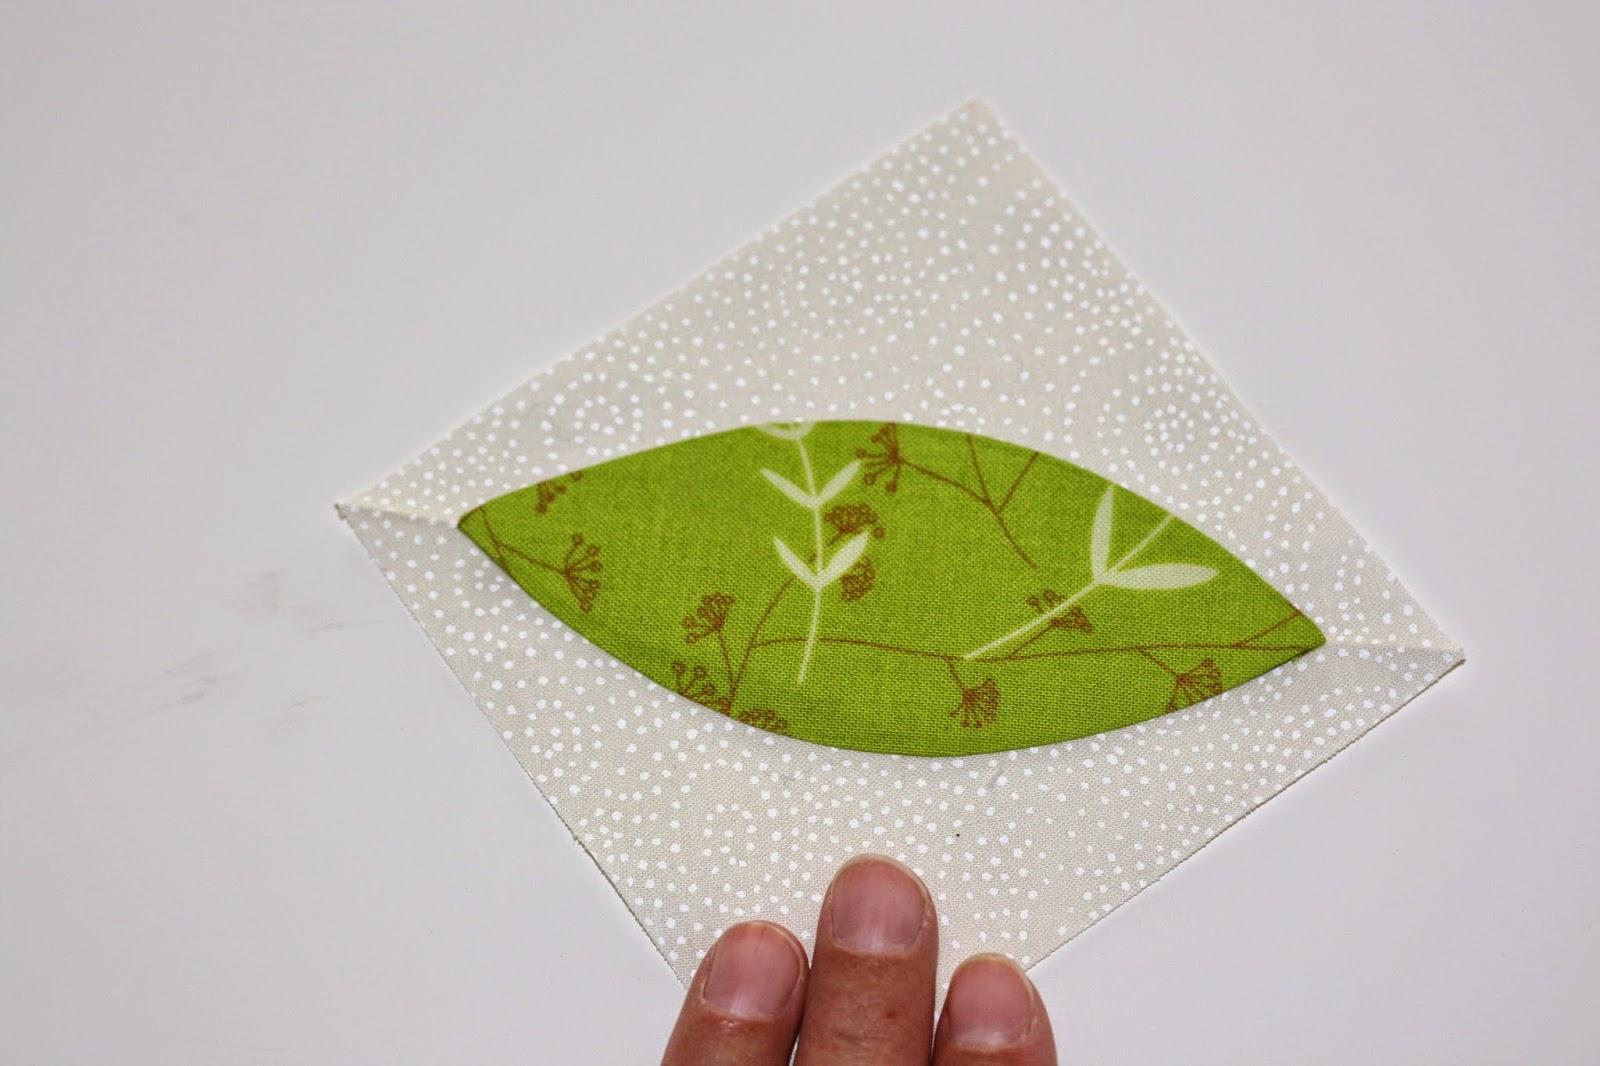 Freezer paper appliqué irarott quilting